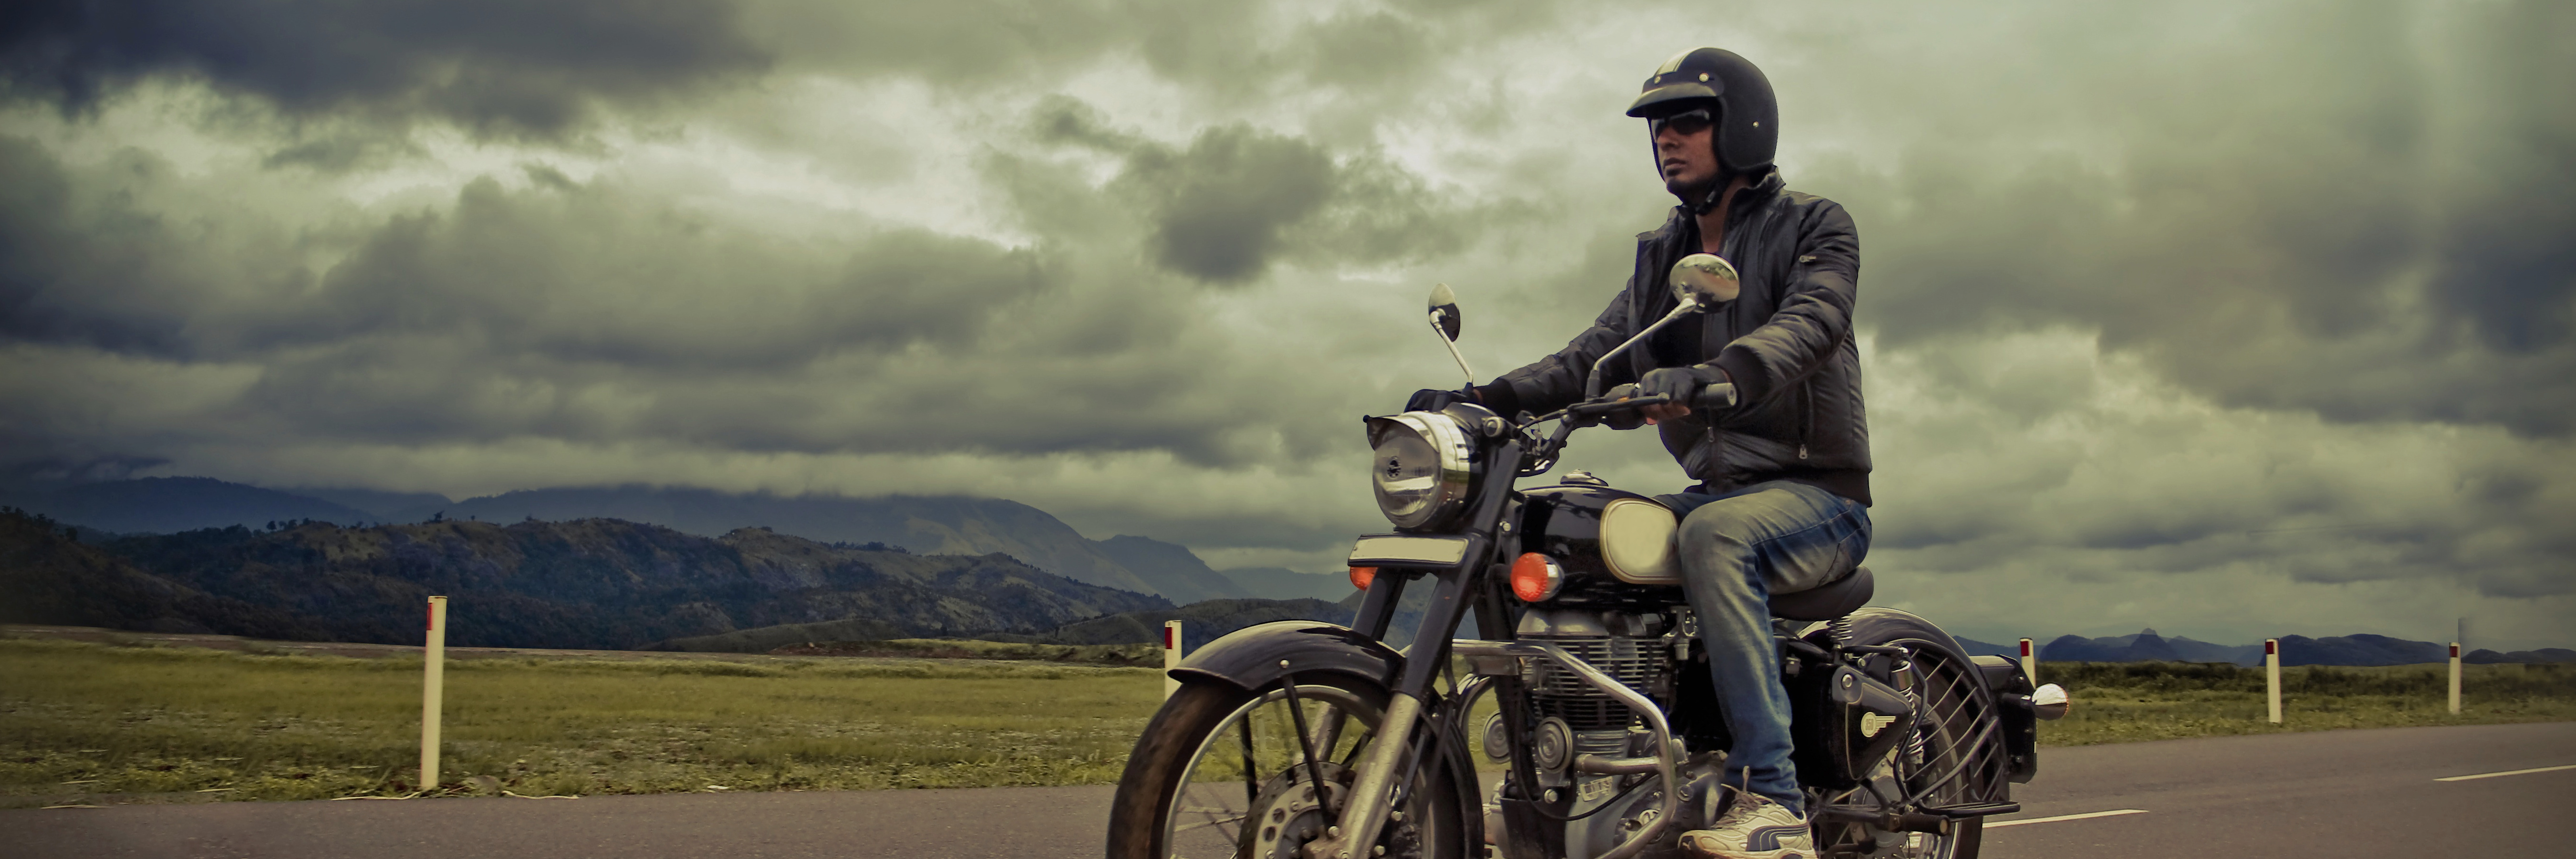 Classic Motorcycles Insurance Principal Insurance